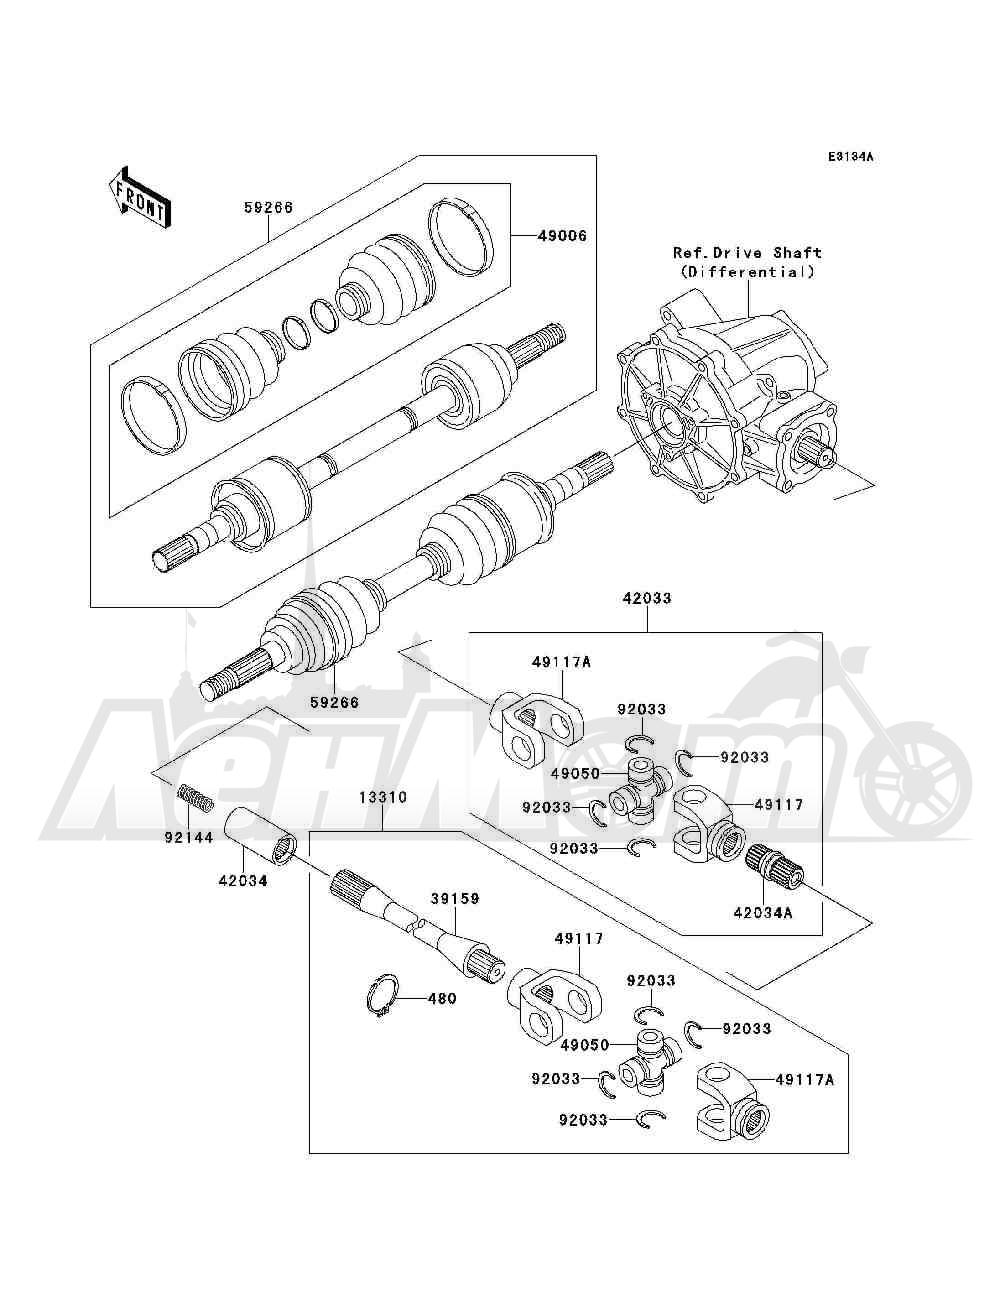 Запчасти для Квадроцикла Kawasaki 1994 BAYOU 300 4X4 (KLF300-C6) Раздел: DRIVE SHAFT(FRONT)(KLF300-C5 / C6) | приводной вал (перед) (KLF300 C5/C6)